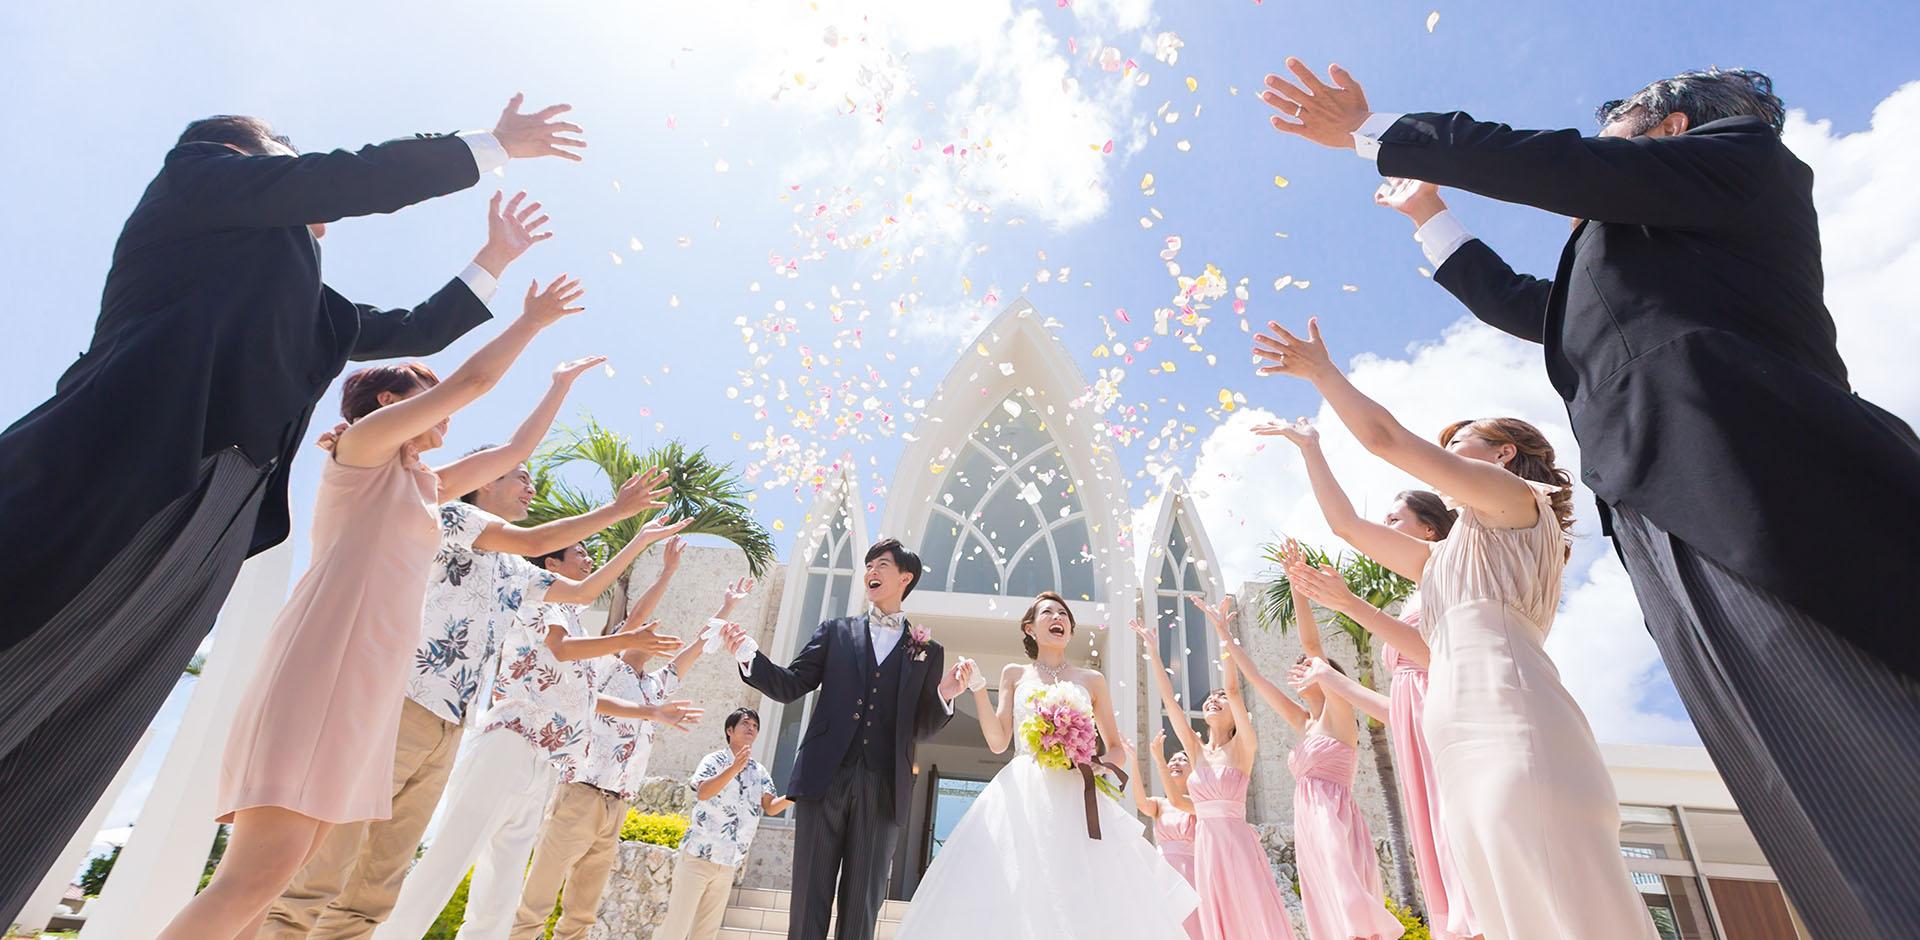 OVERSEAS WEDDING 海外婚禮